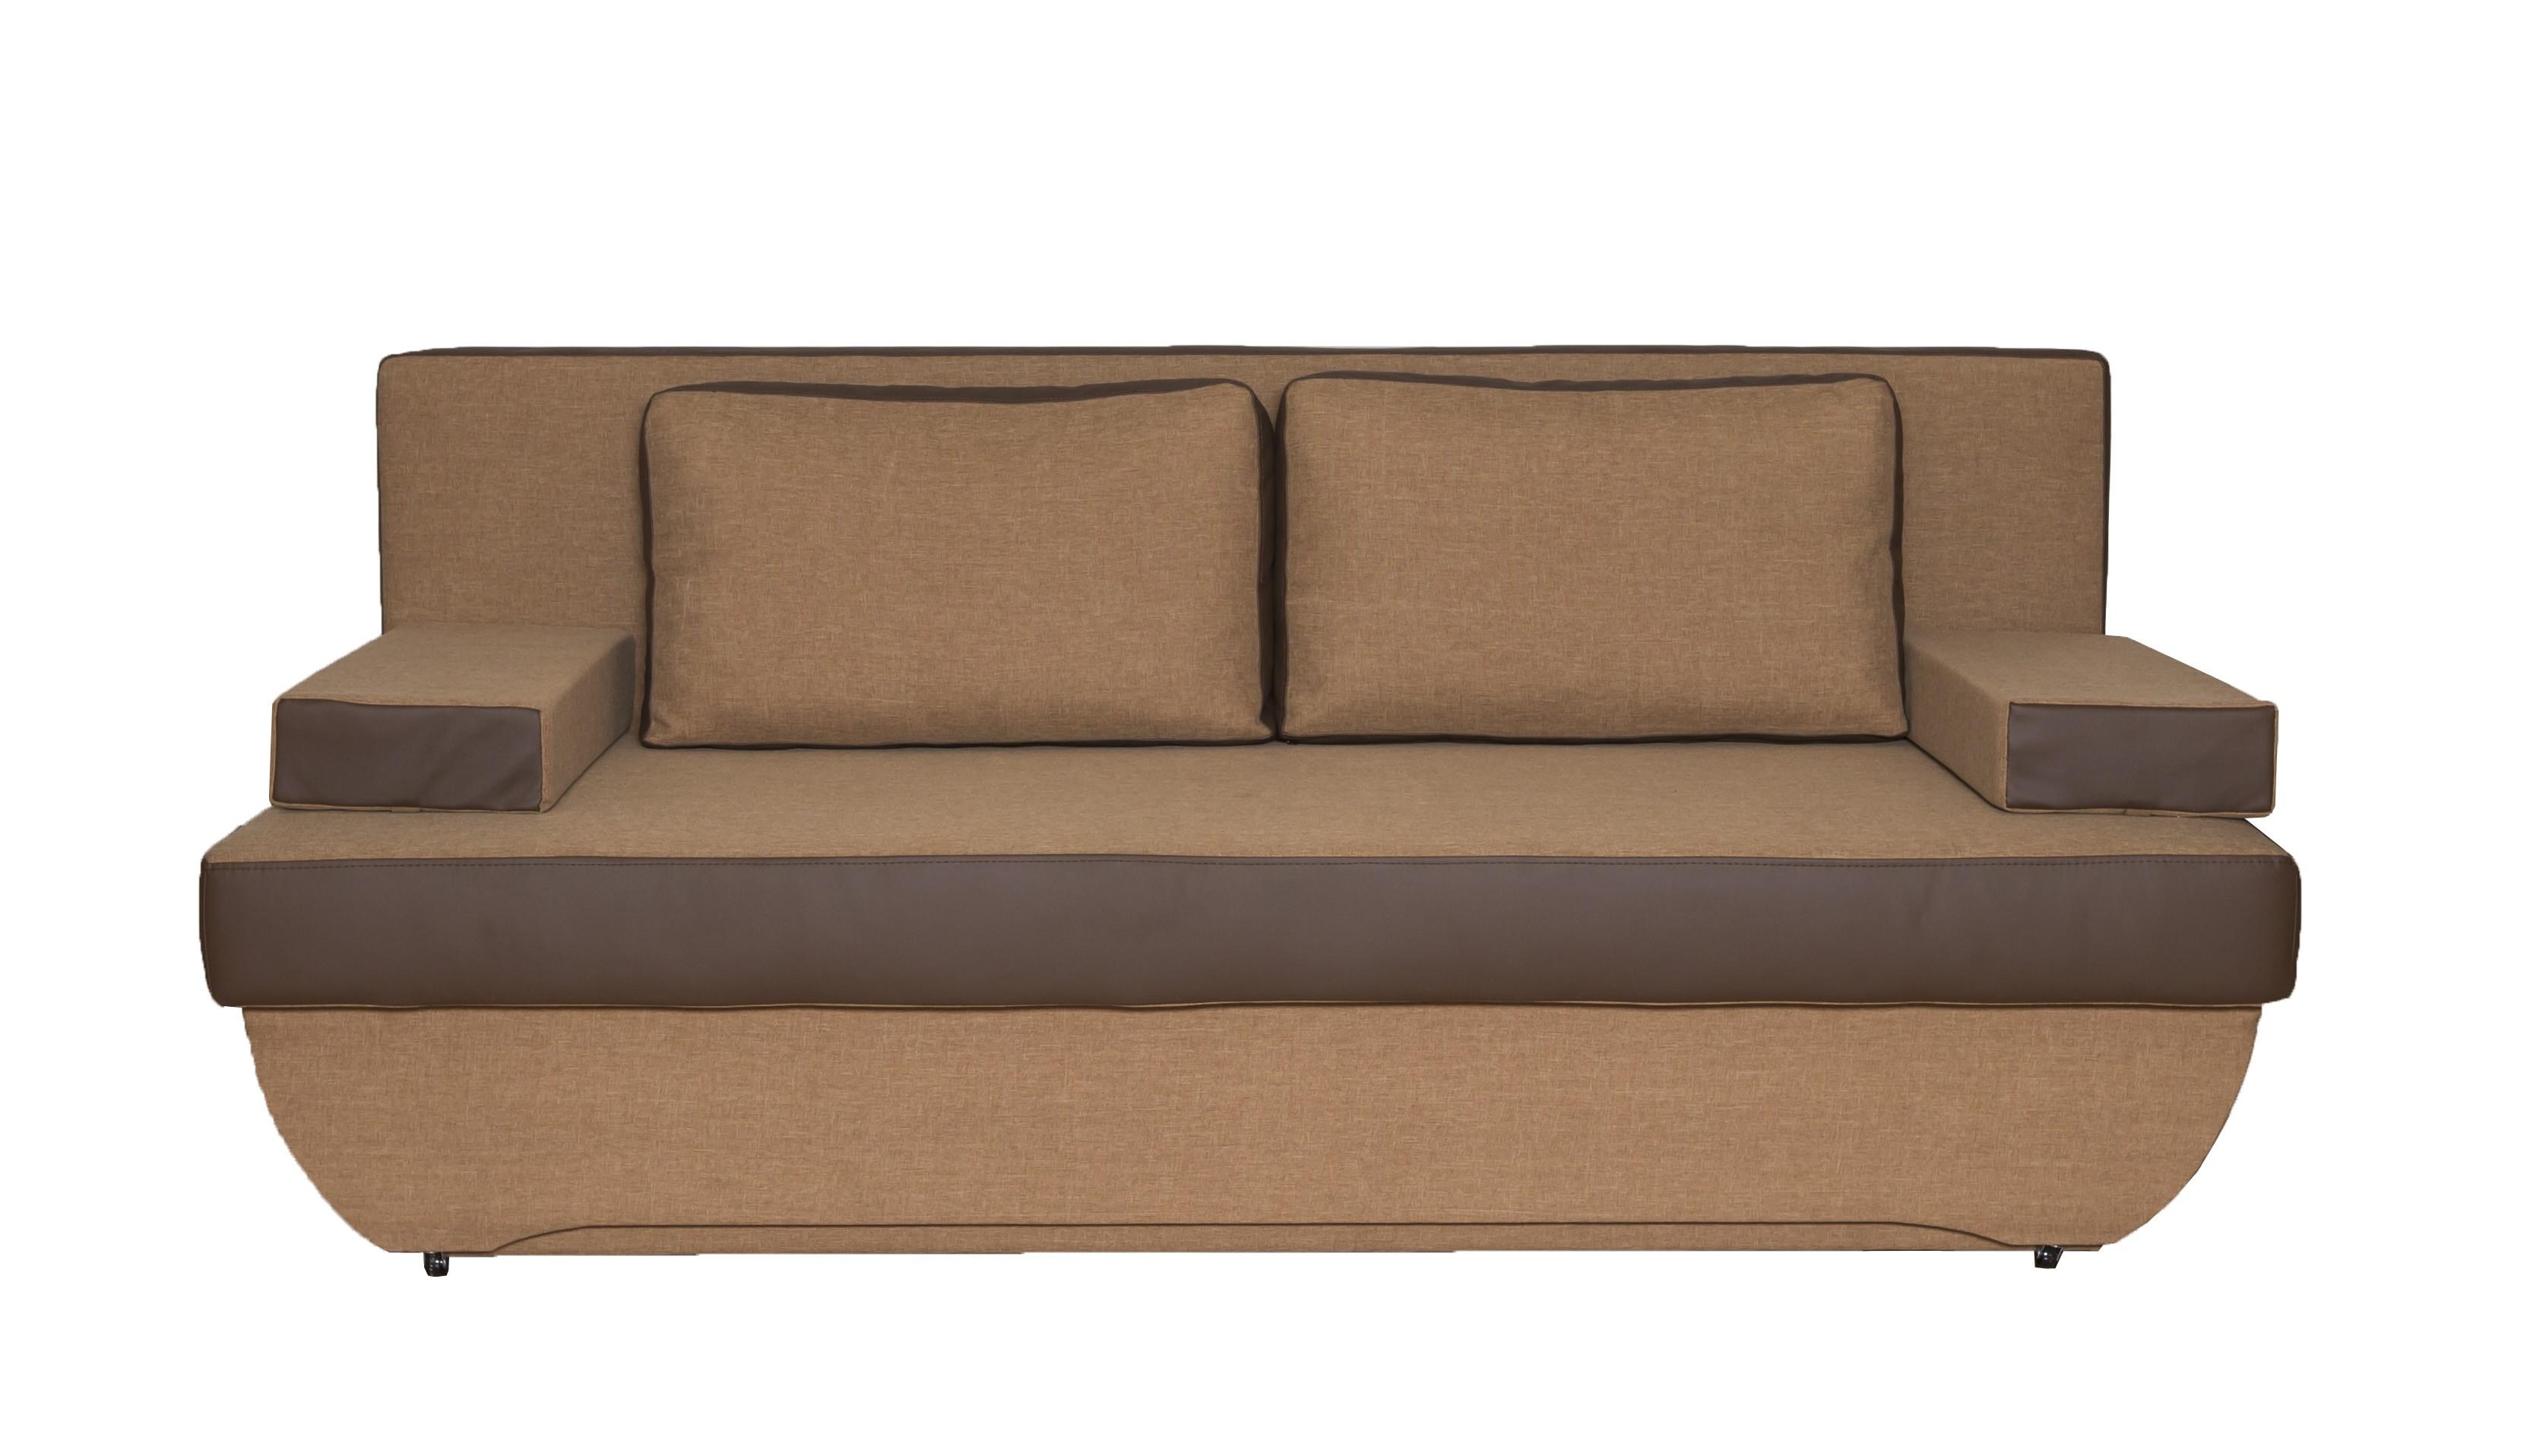 Dedeman canapea eco diverse culori 2c dedicat planurilor for Canapele extensibile de o persoana